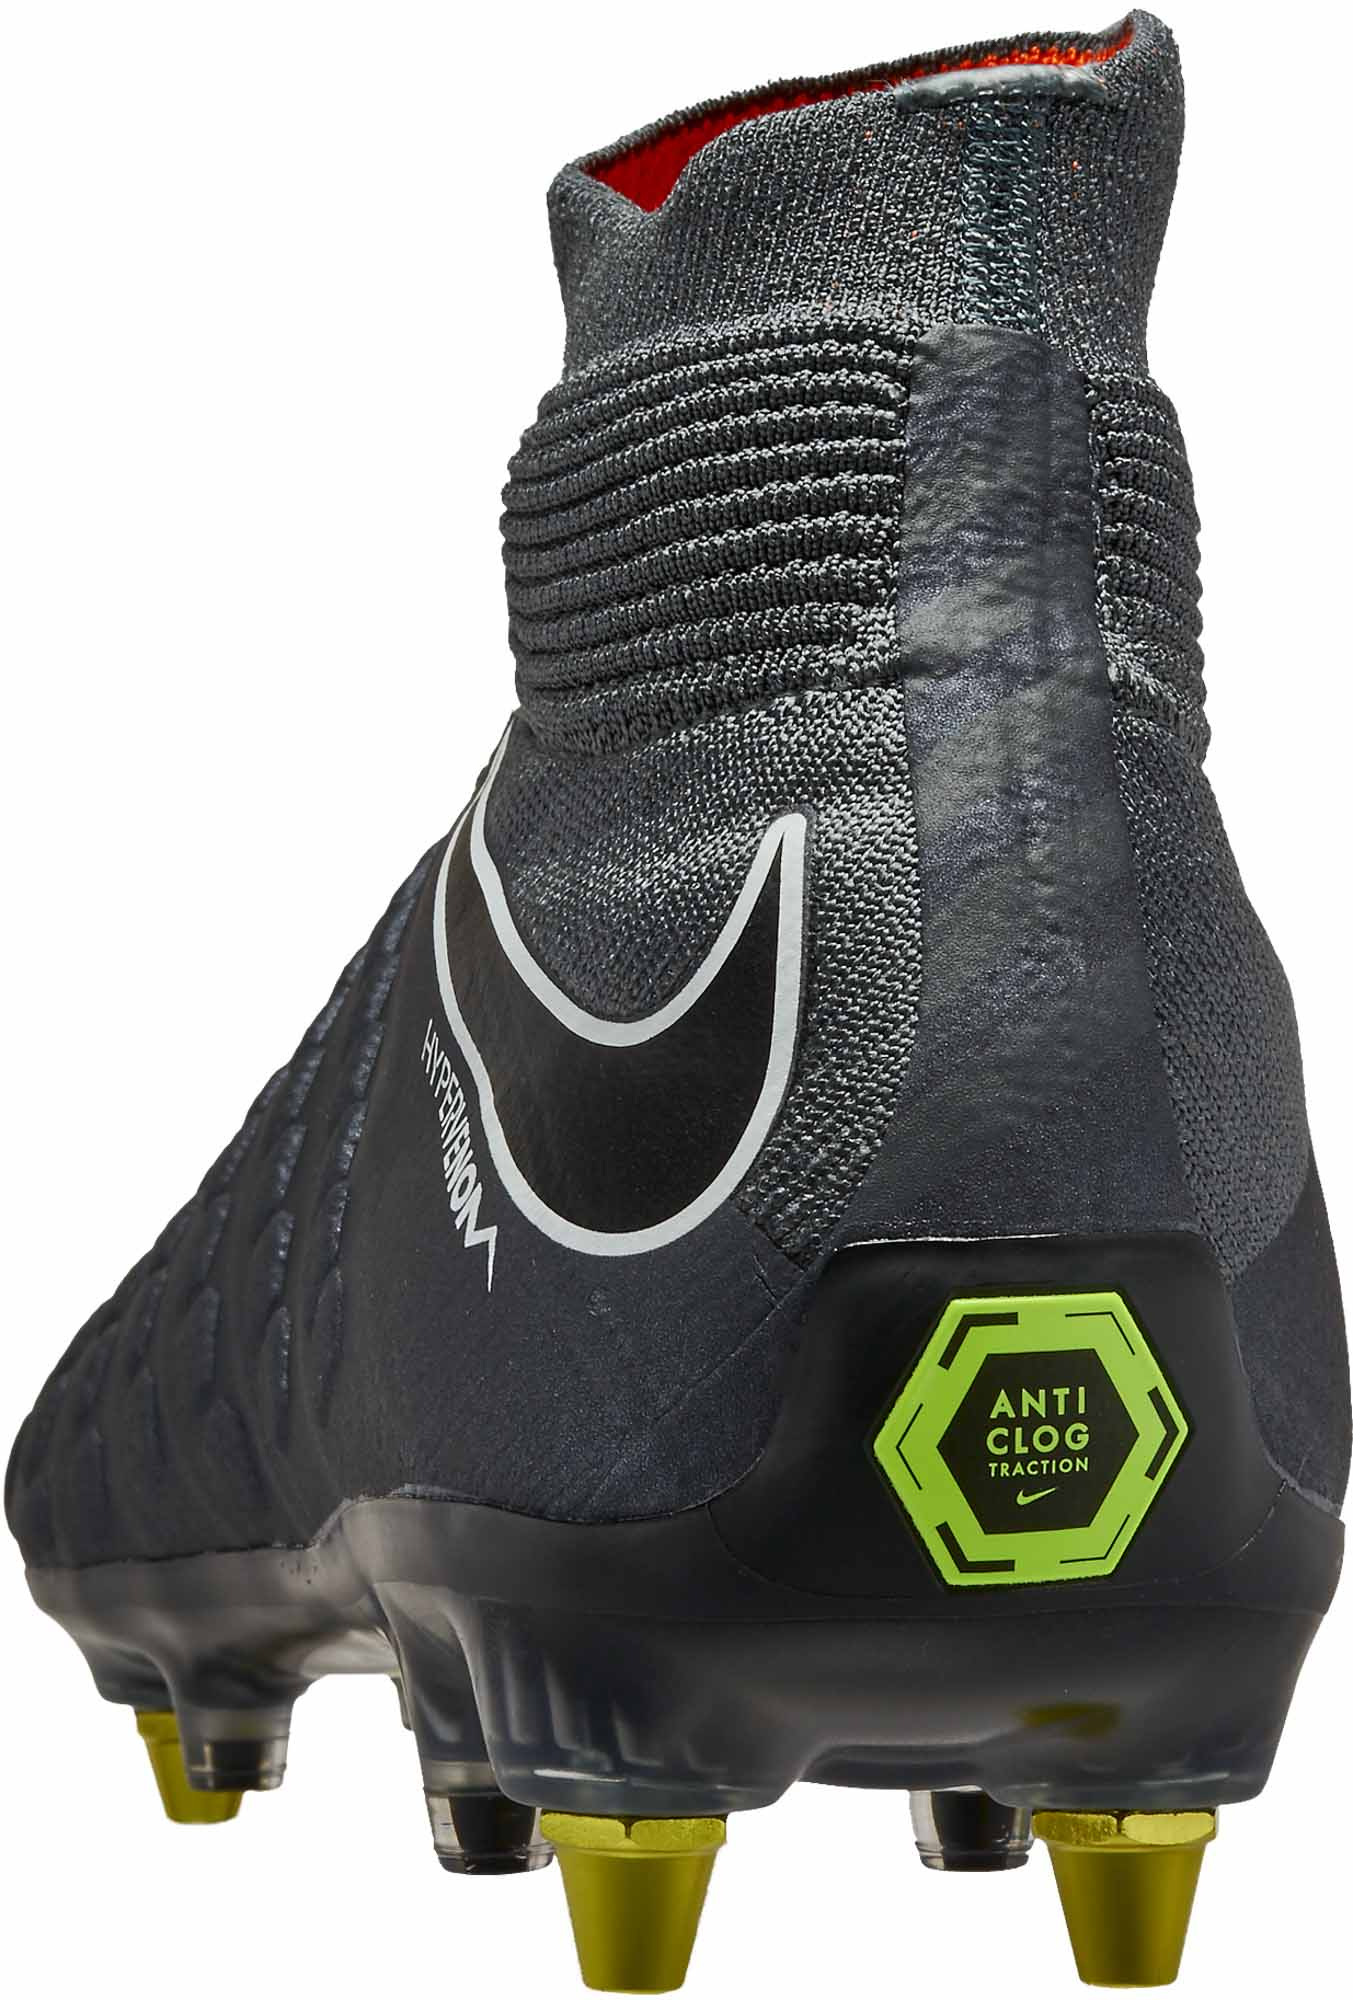 super popular 5deee 39dbf Nike Hypervenom Phantom III DF SG-Pro Elite - SoccerPro